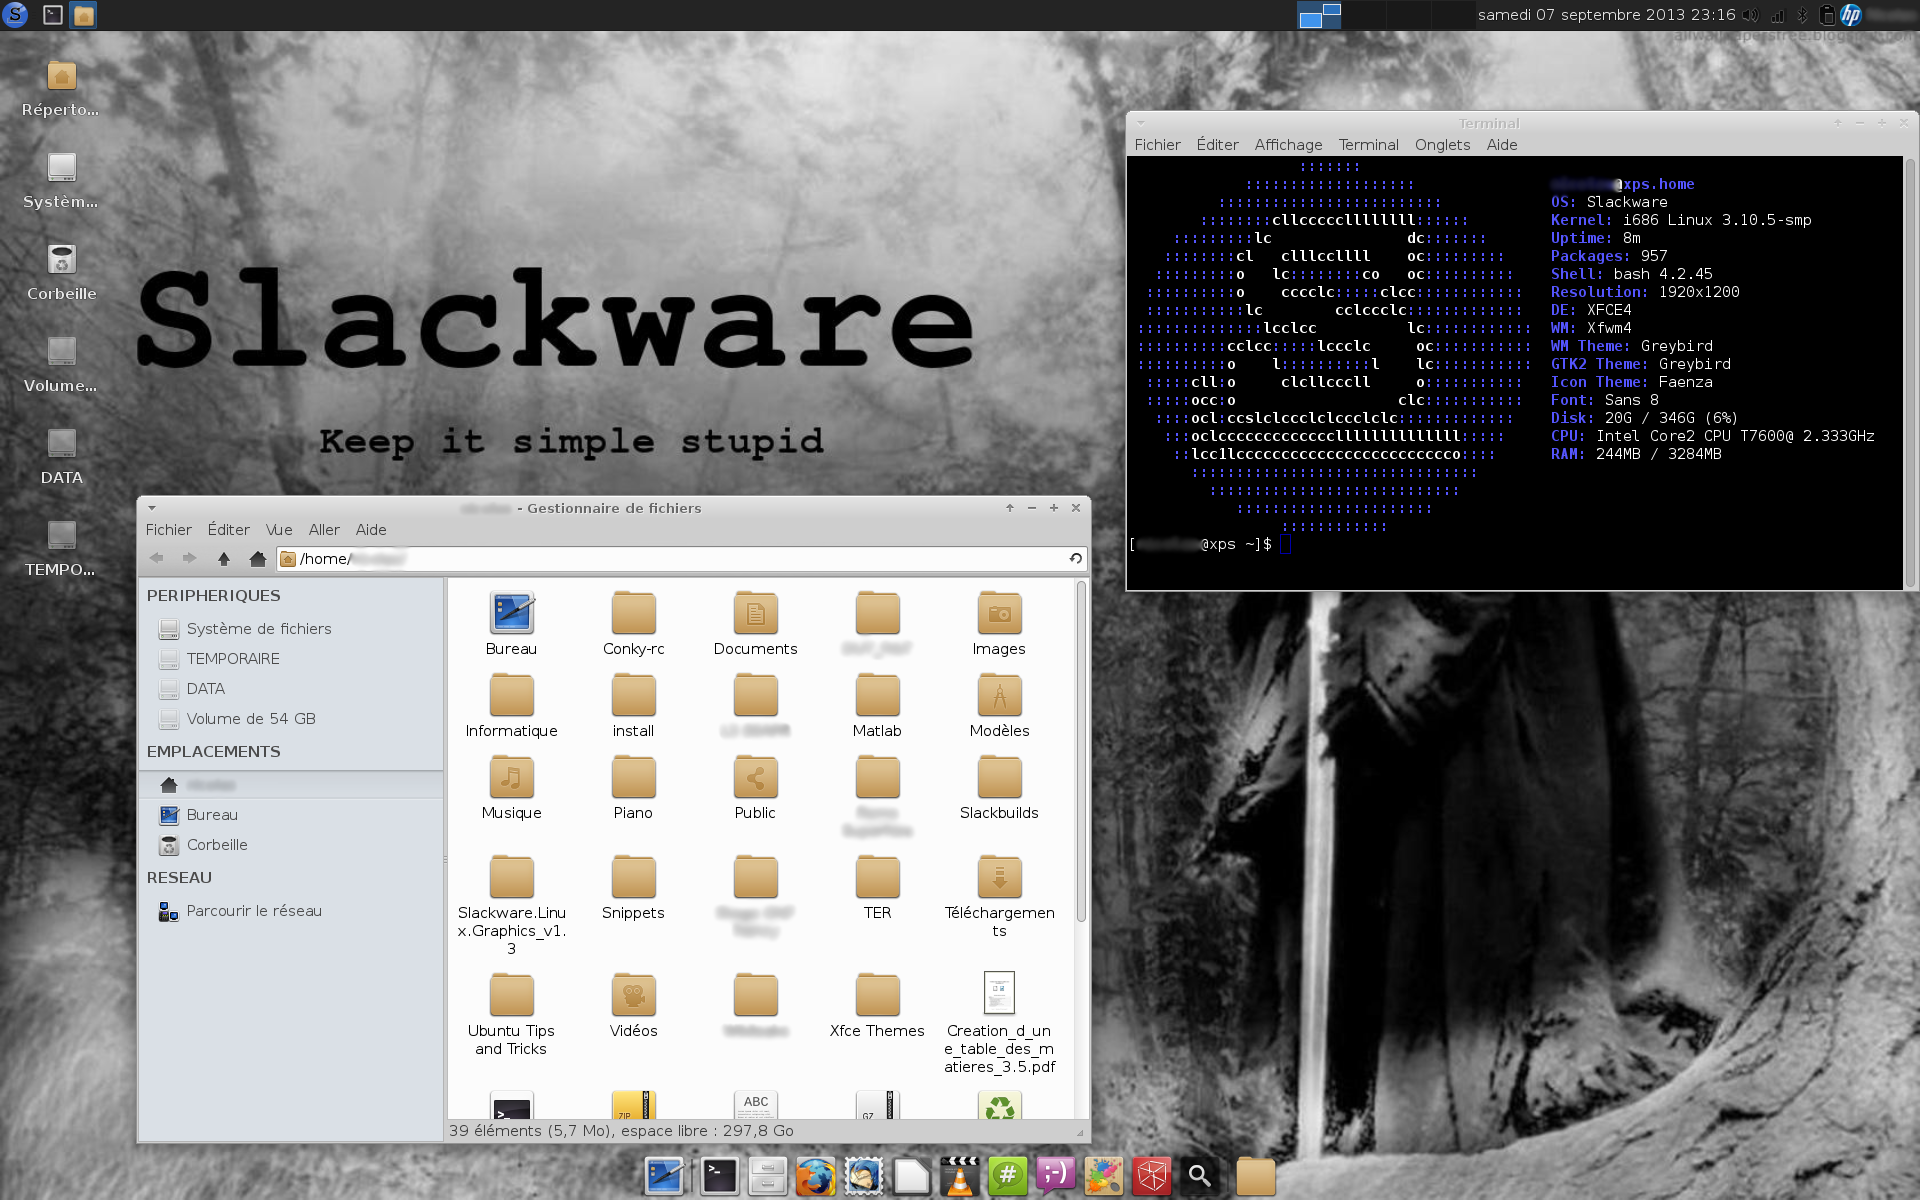 http://image.noelshack.com/fichiers/2013/36/1378589338-slackware-nico.png